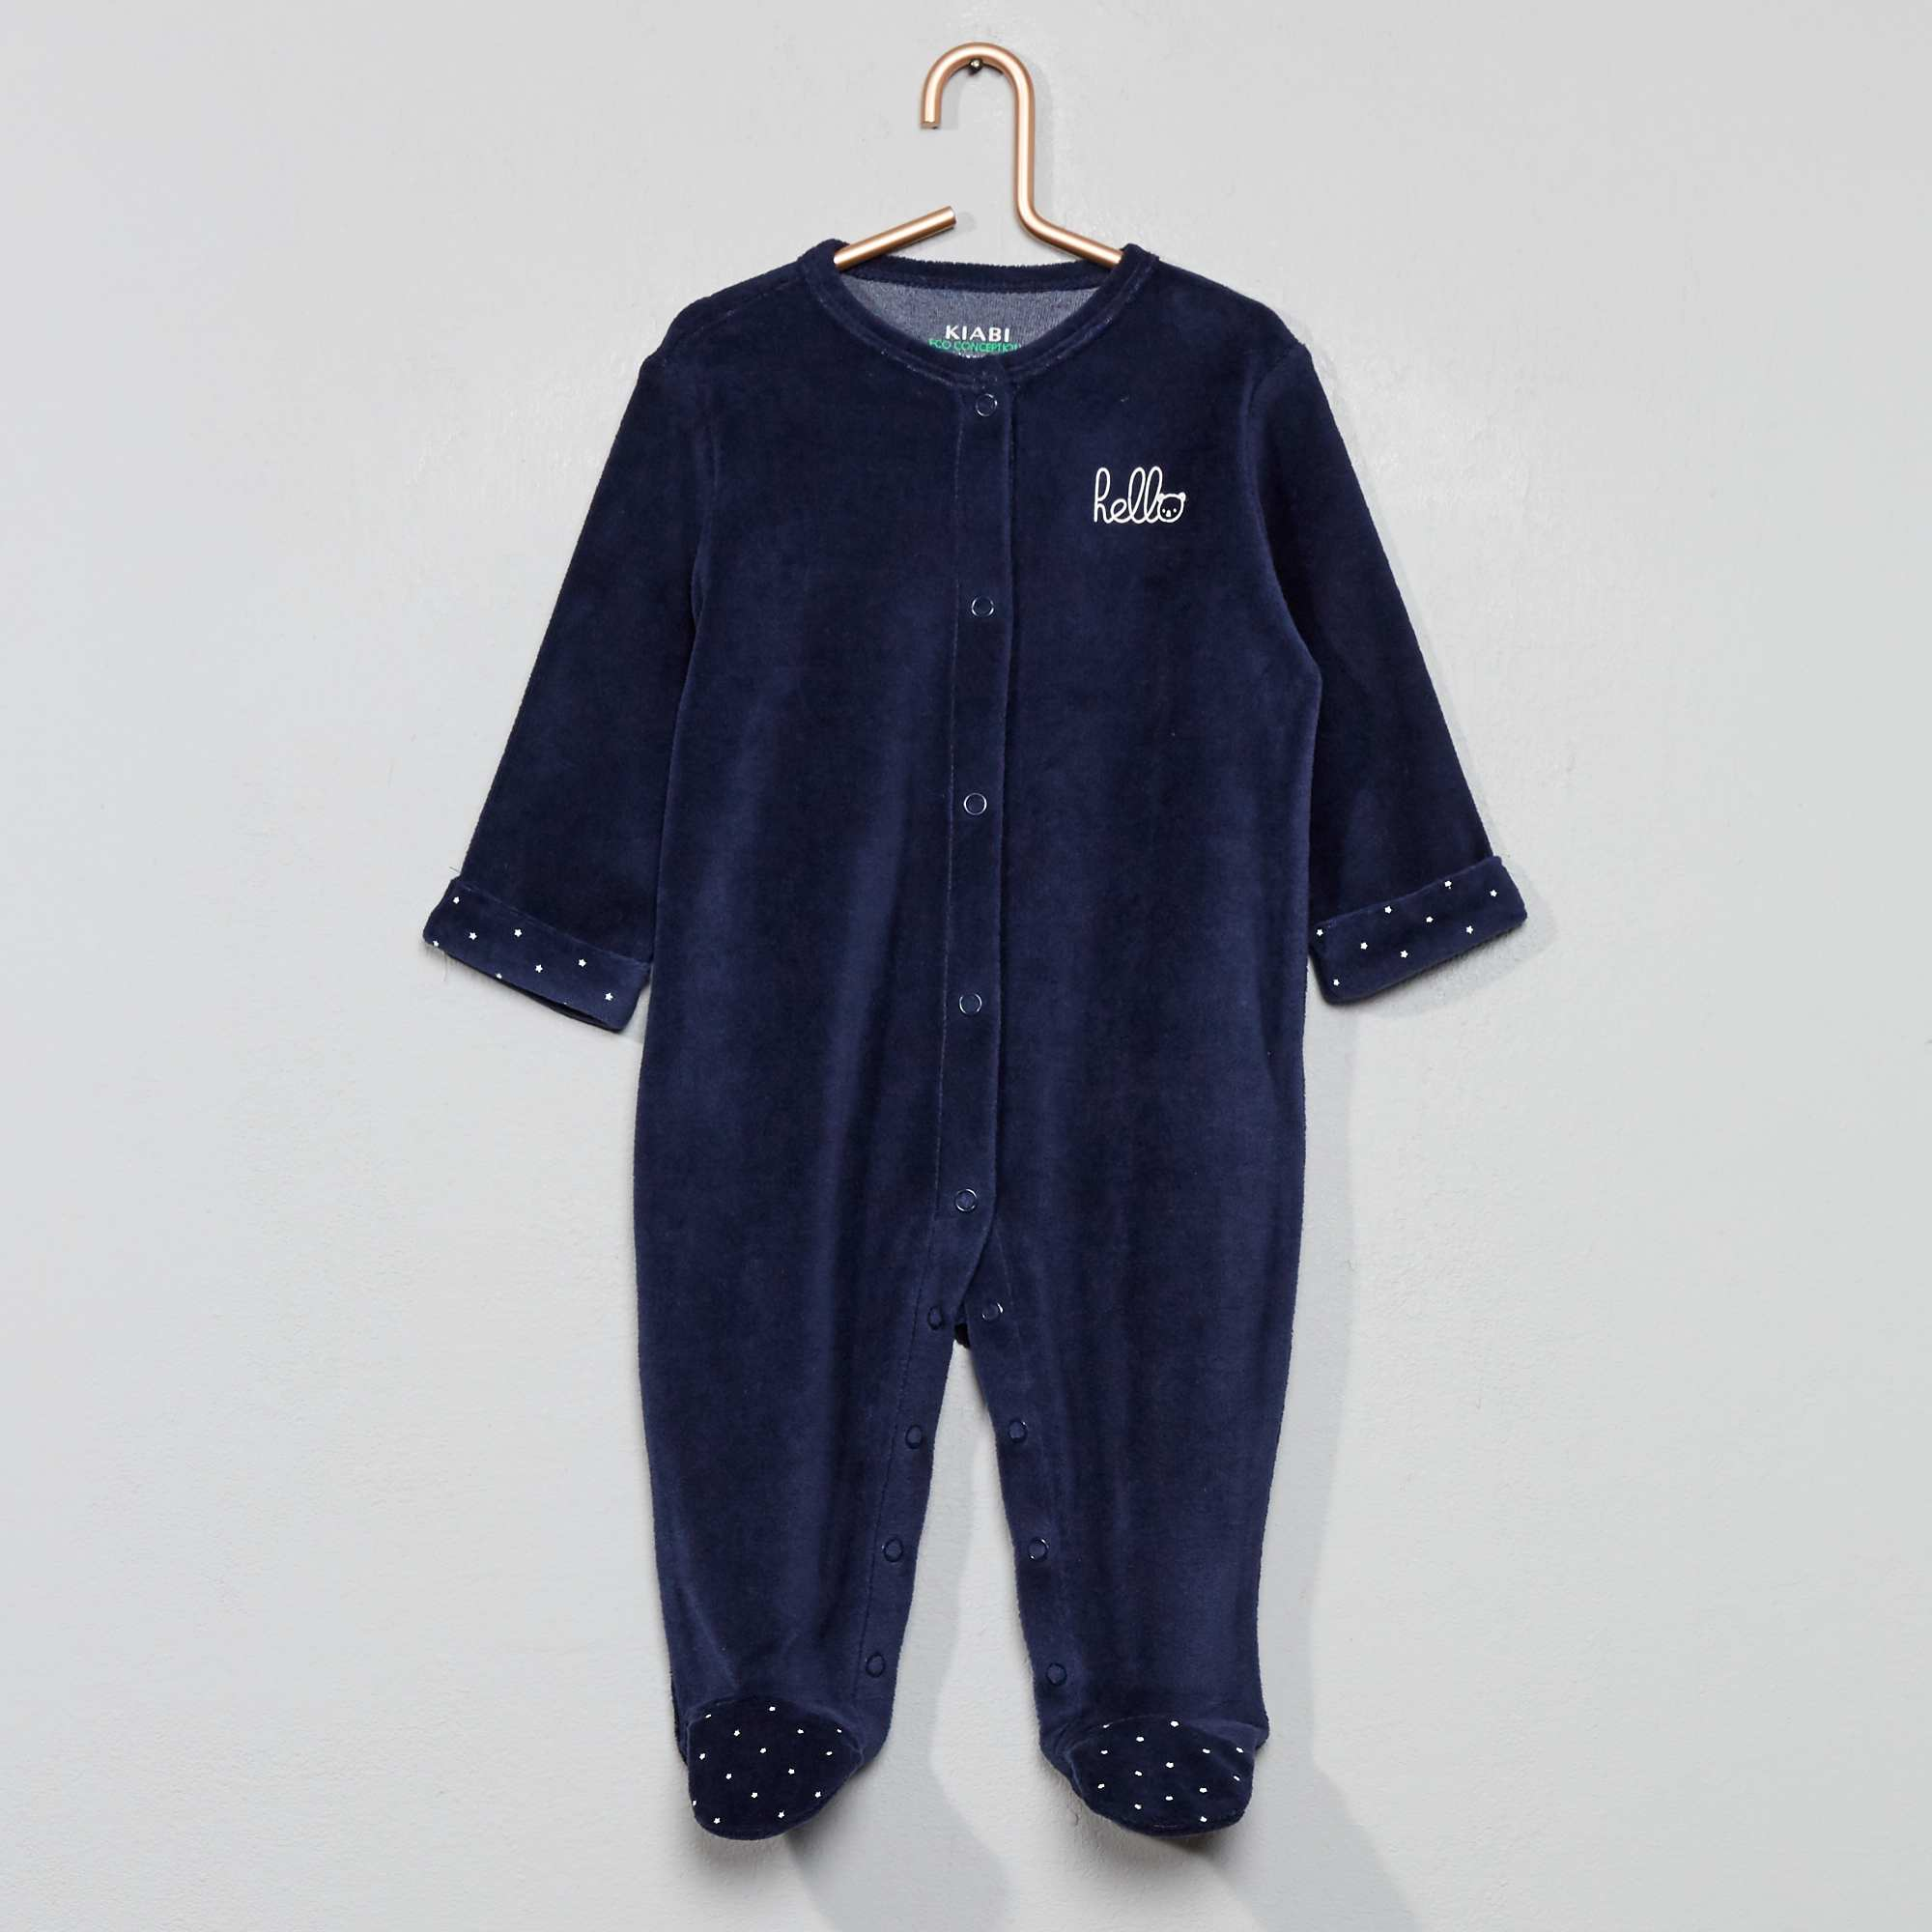 0eb1f31c1 Pijama de terciopelo 'hello' de algodón orgánico Bebé niño - azul ...